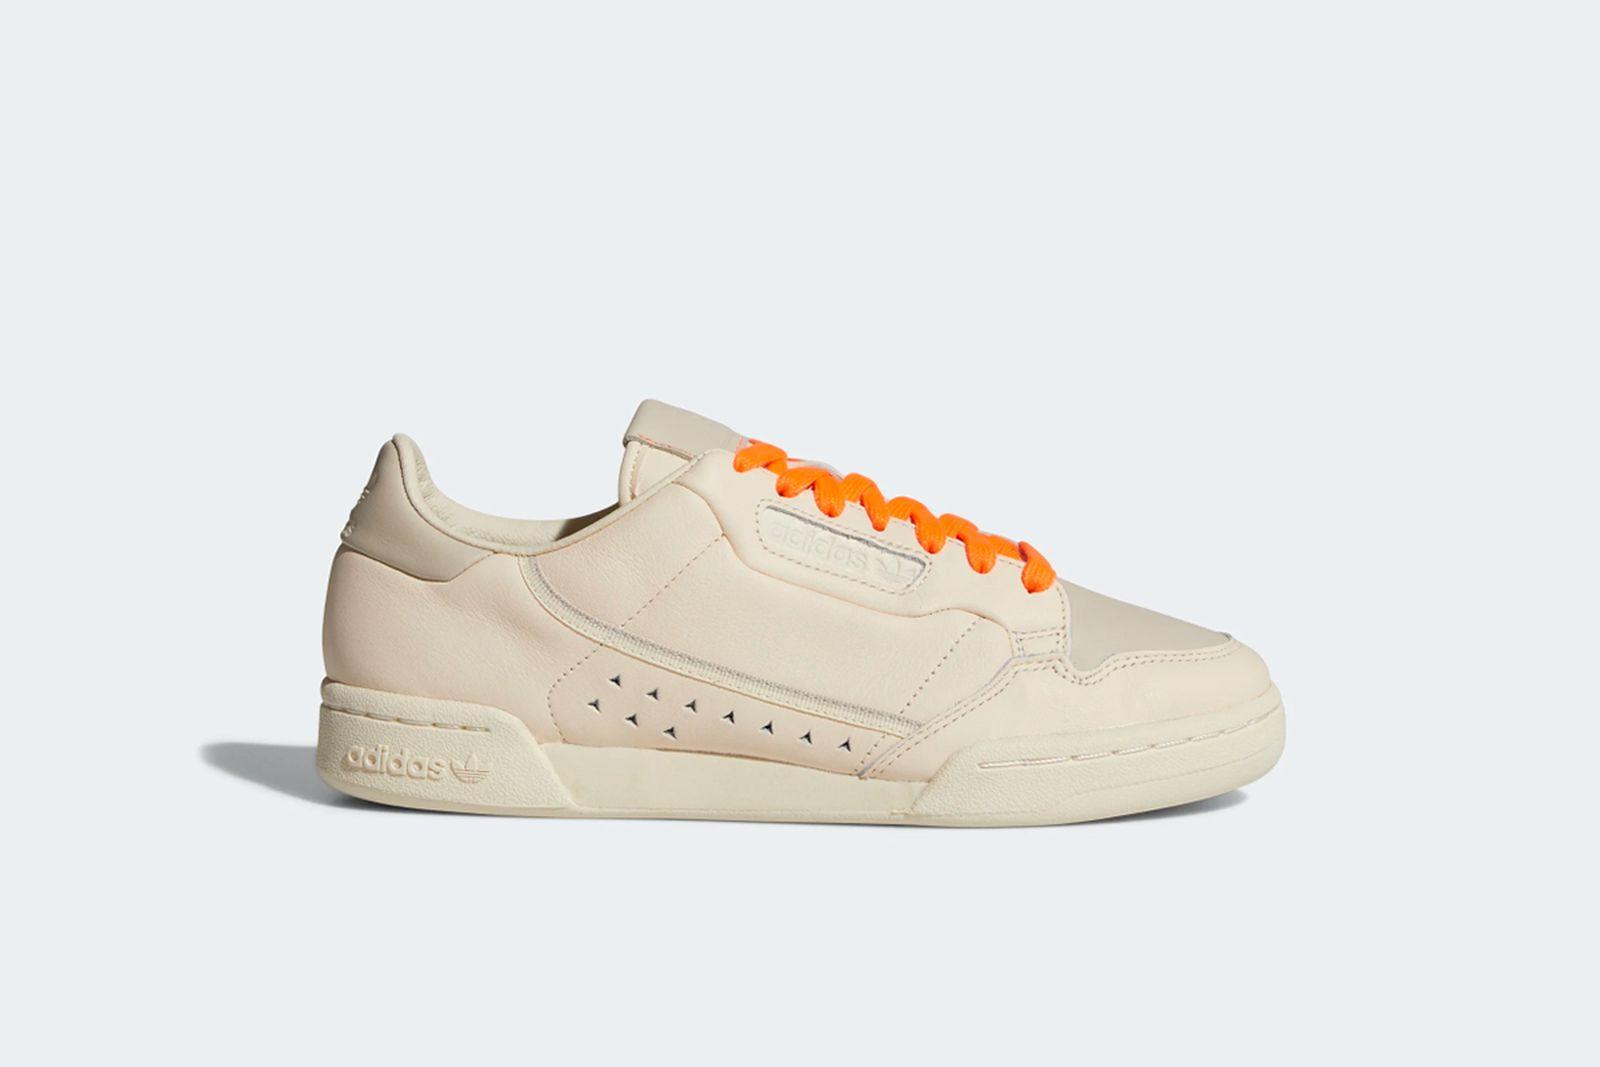 Pharrell Williams x Adidas 2020 Continental 80 Sneaker